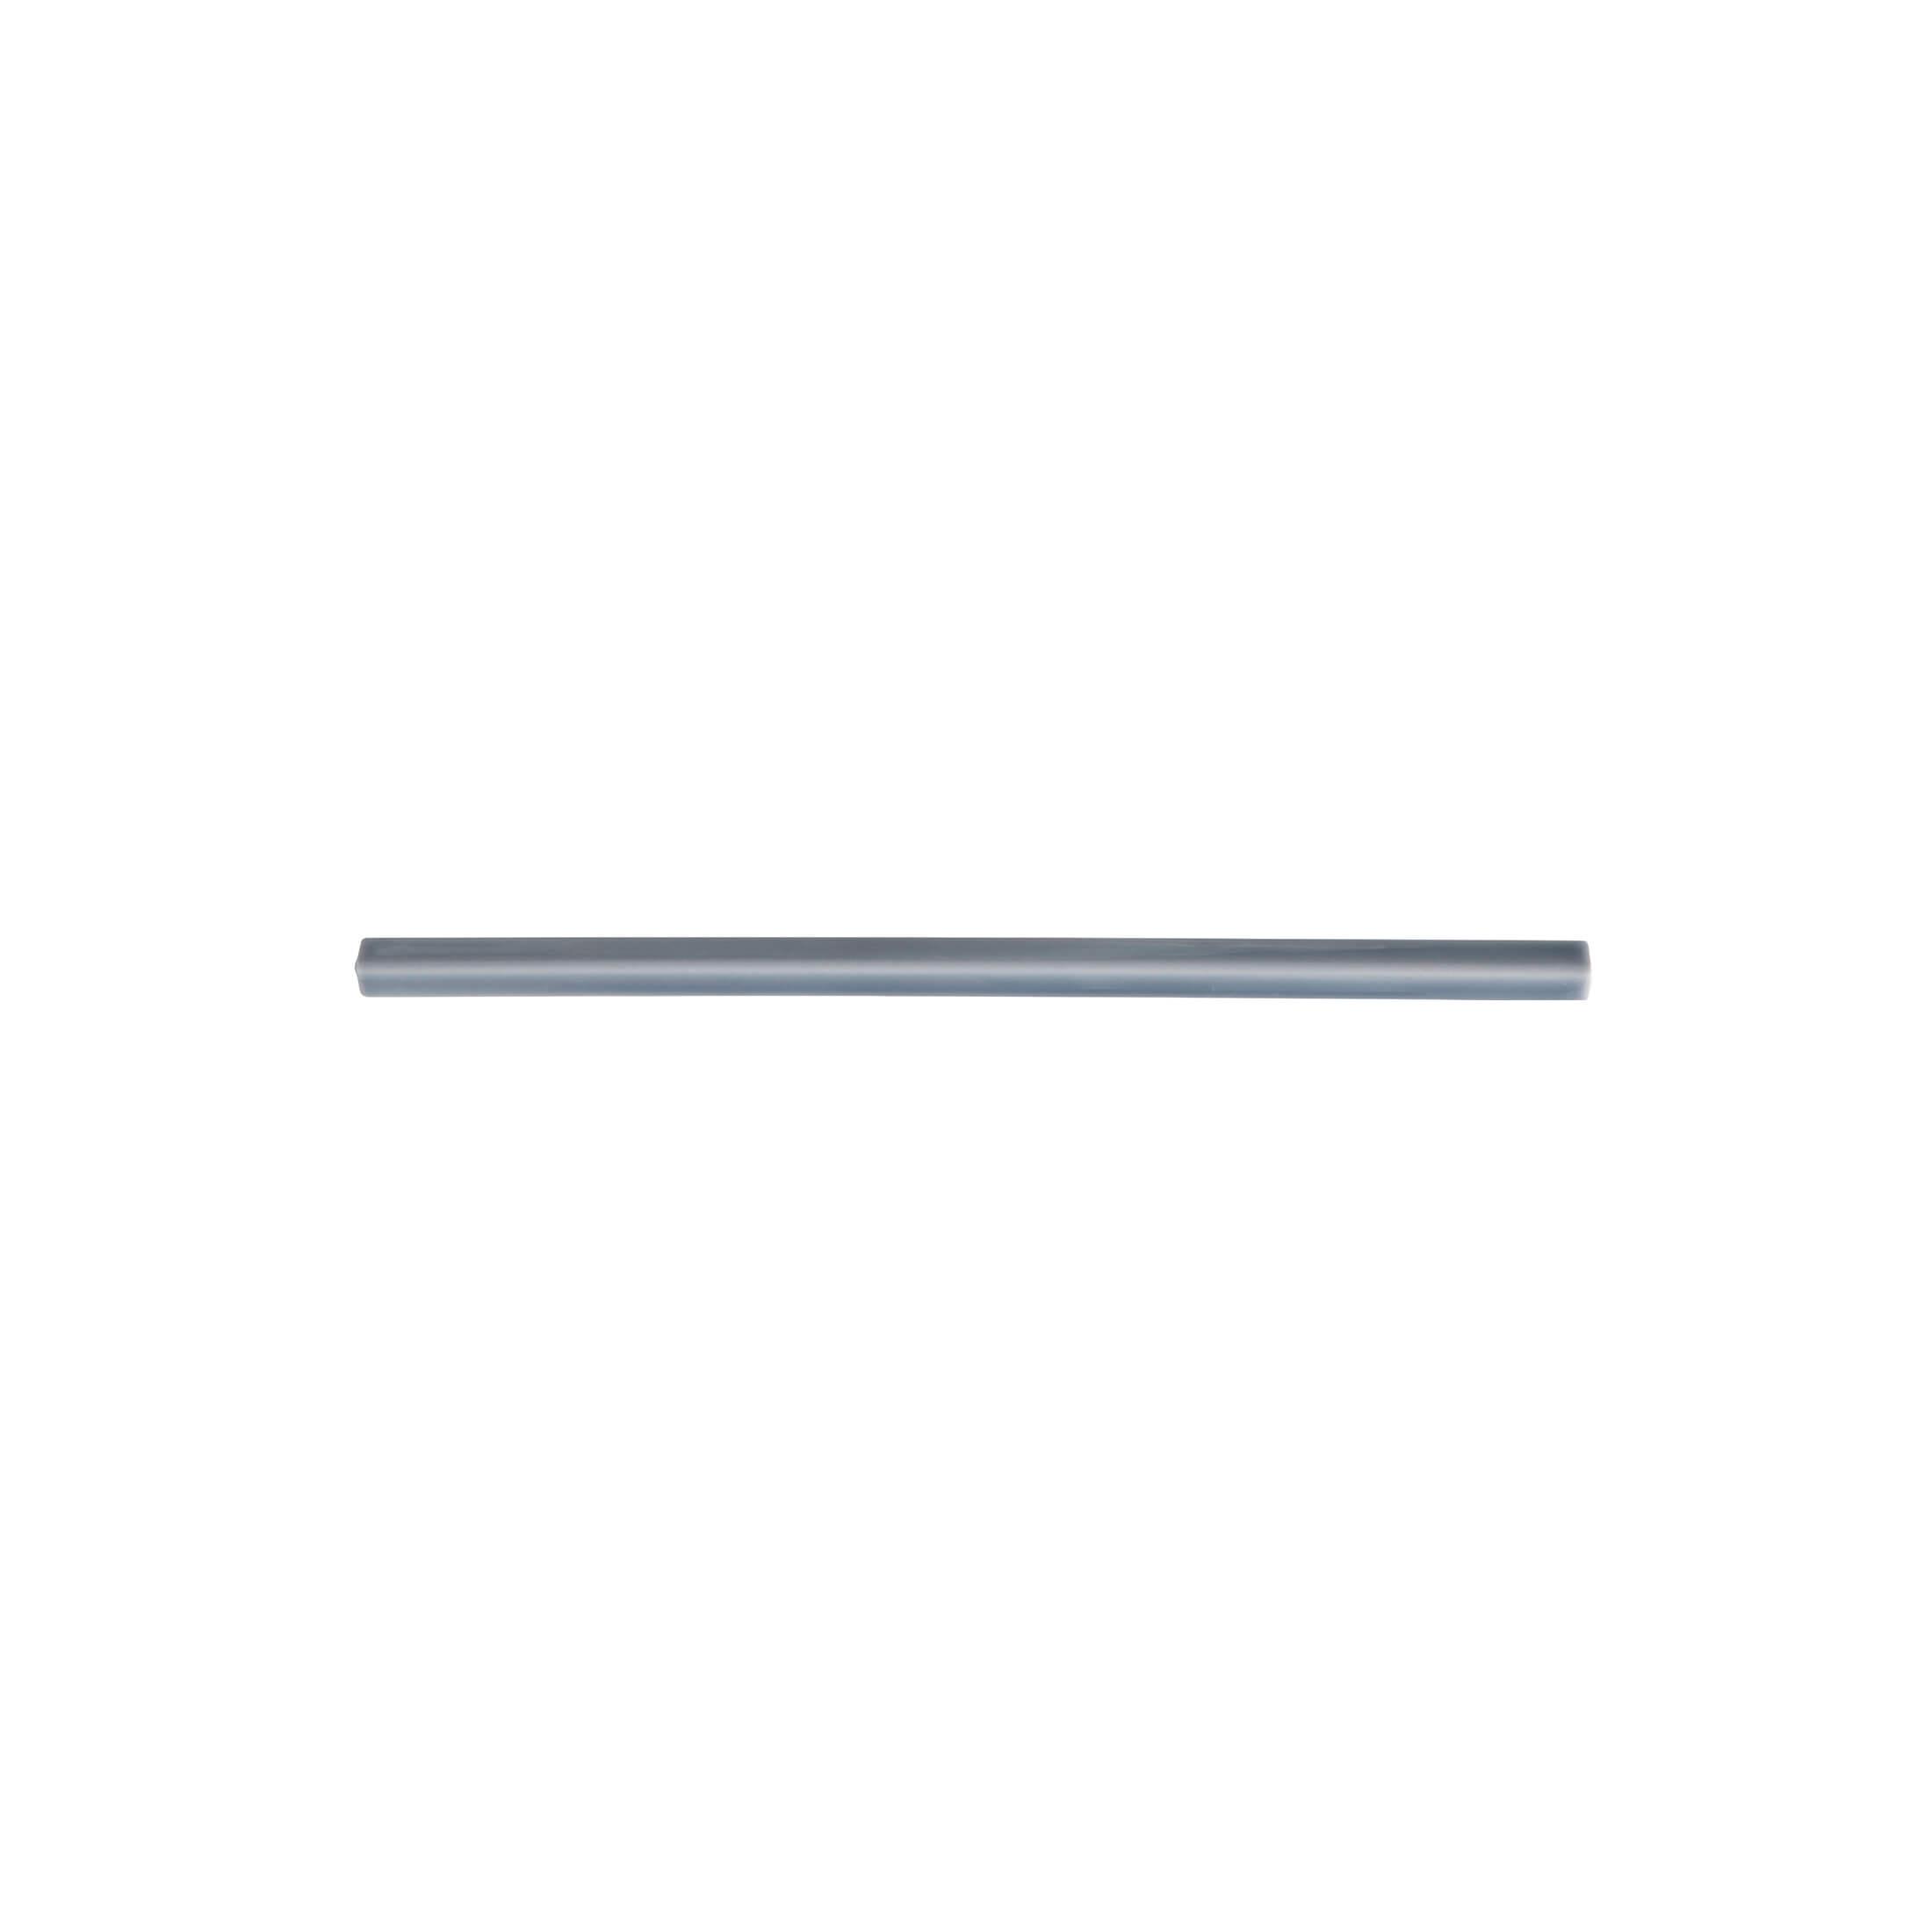 ADNE5611 - BULLNOSE TRIM - 0.85 cm X 20 cm